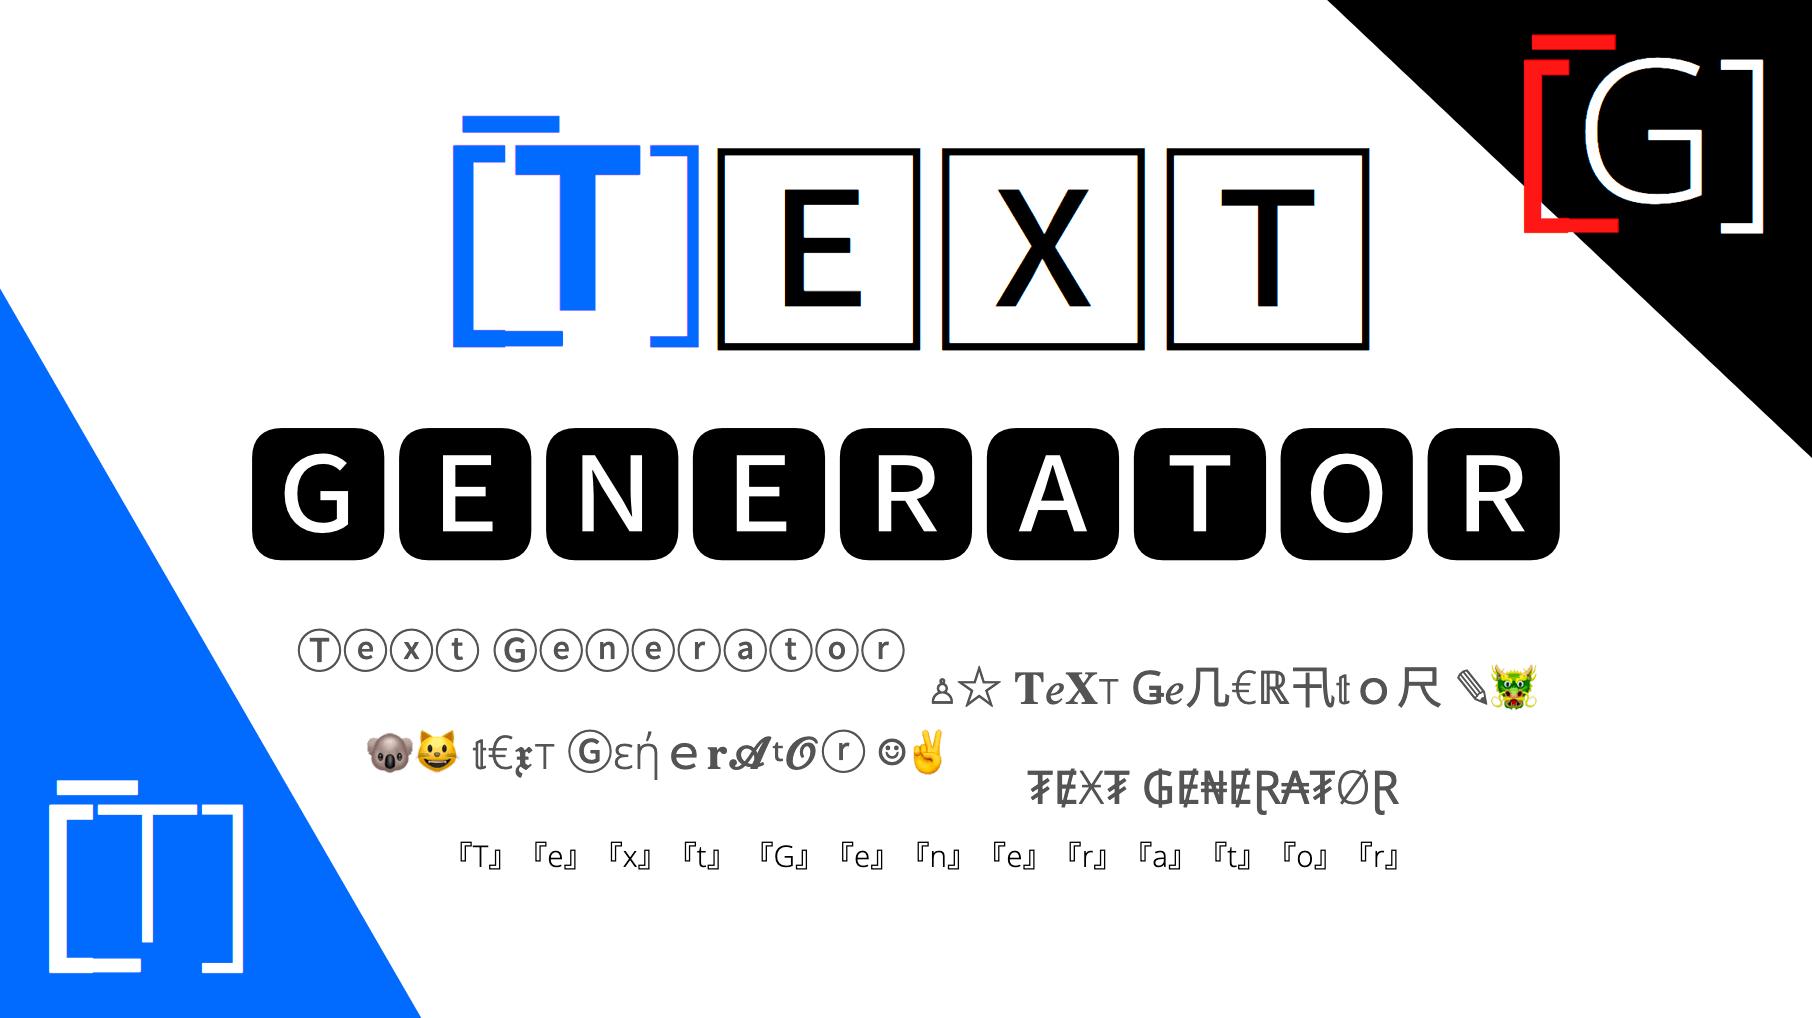 Text Generator ᐈ 1 ℭ𝔬𝔭𝔶 ℙ𝕒𝕤𝕥𝕖 Text Font